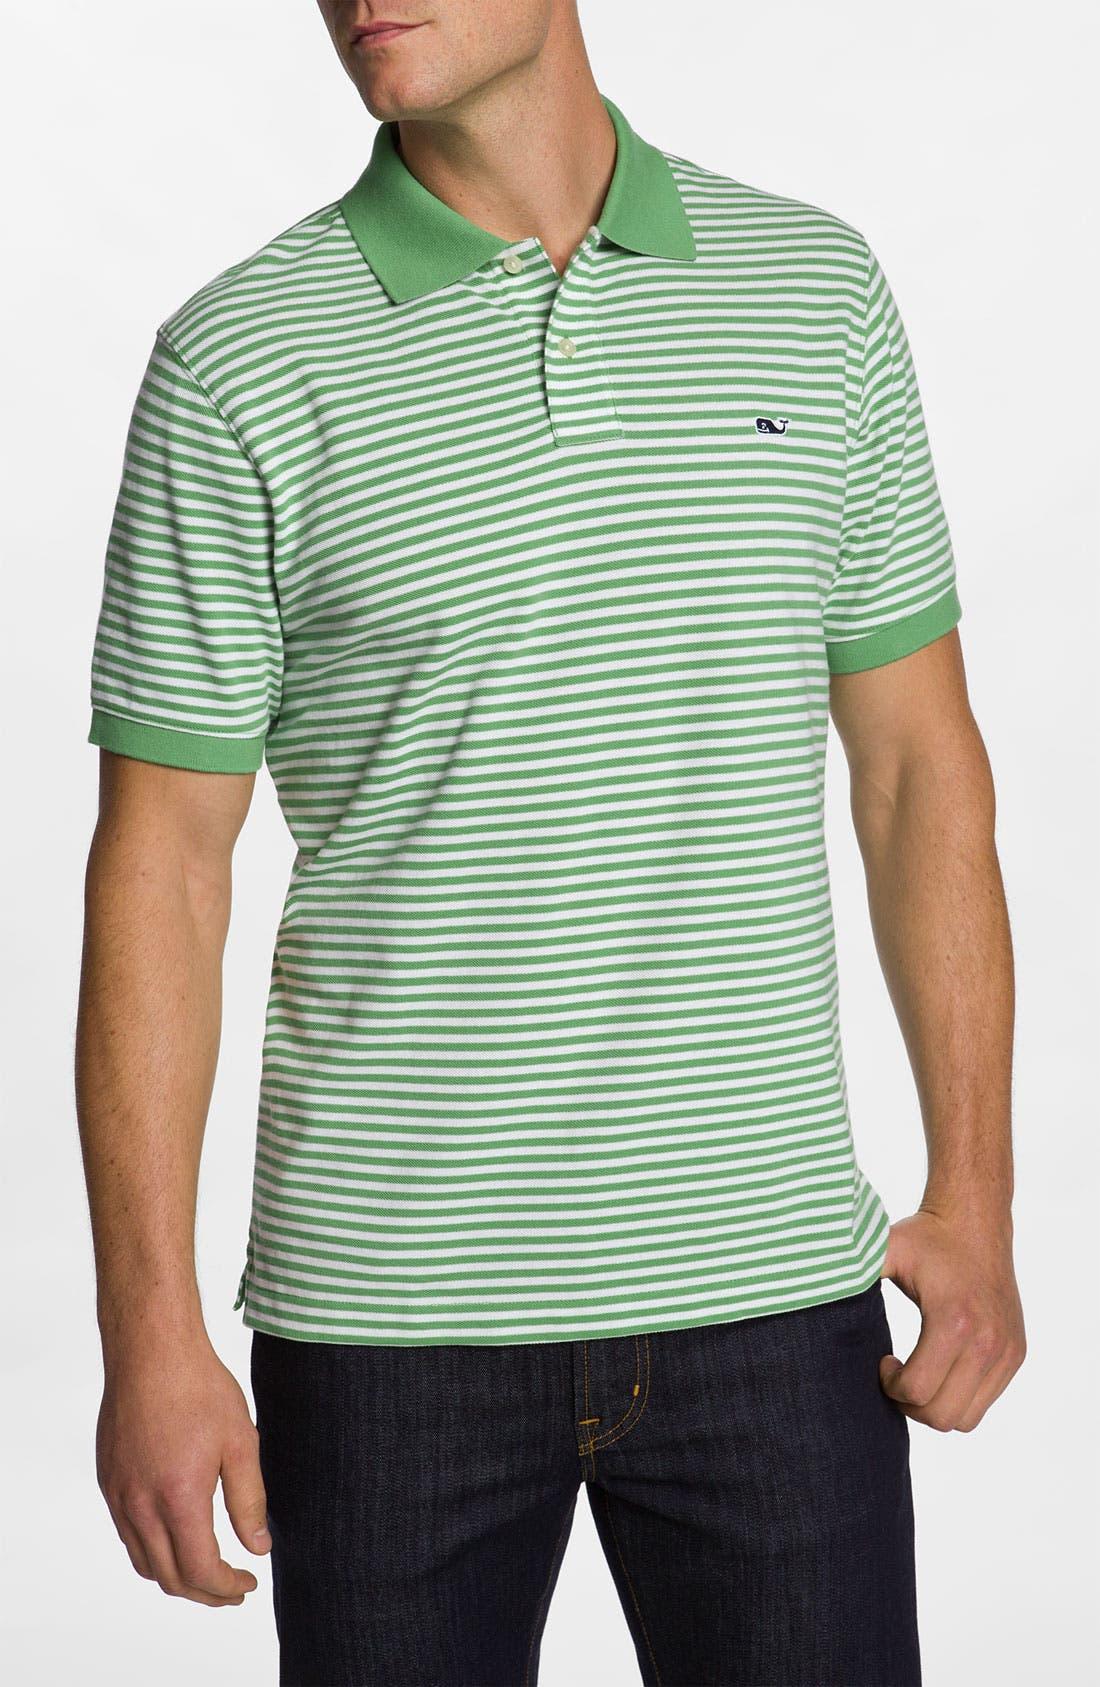 Main Image - Vineyard Vines 'State Line Stripe - Classic' Piqué Knit Polo